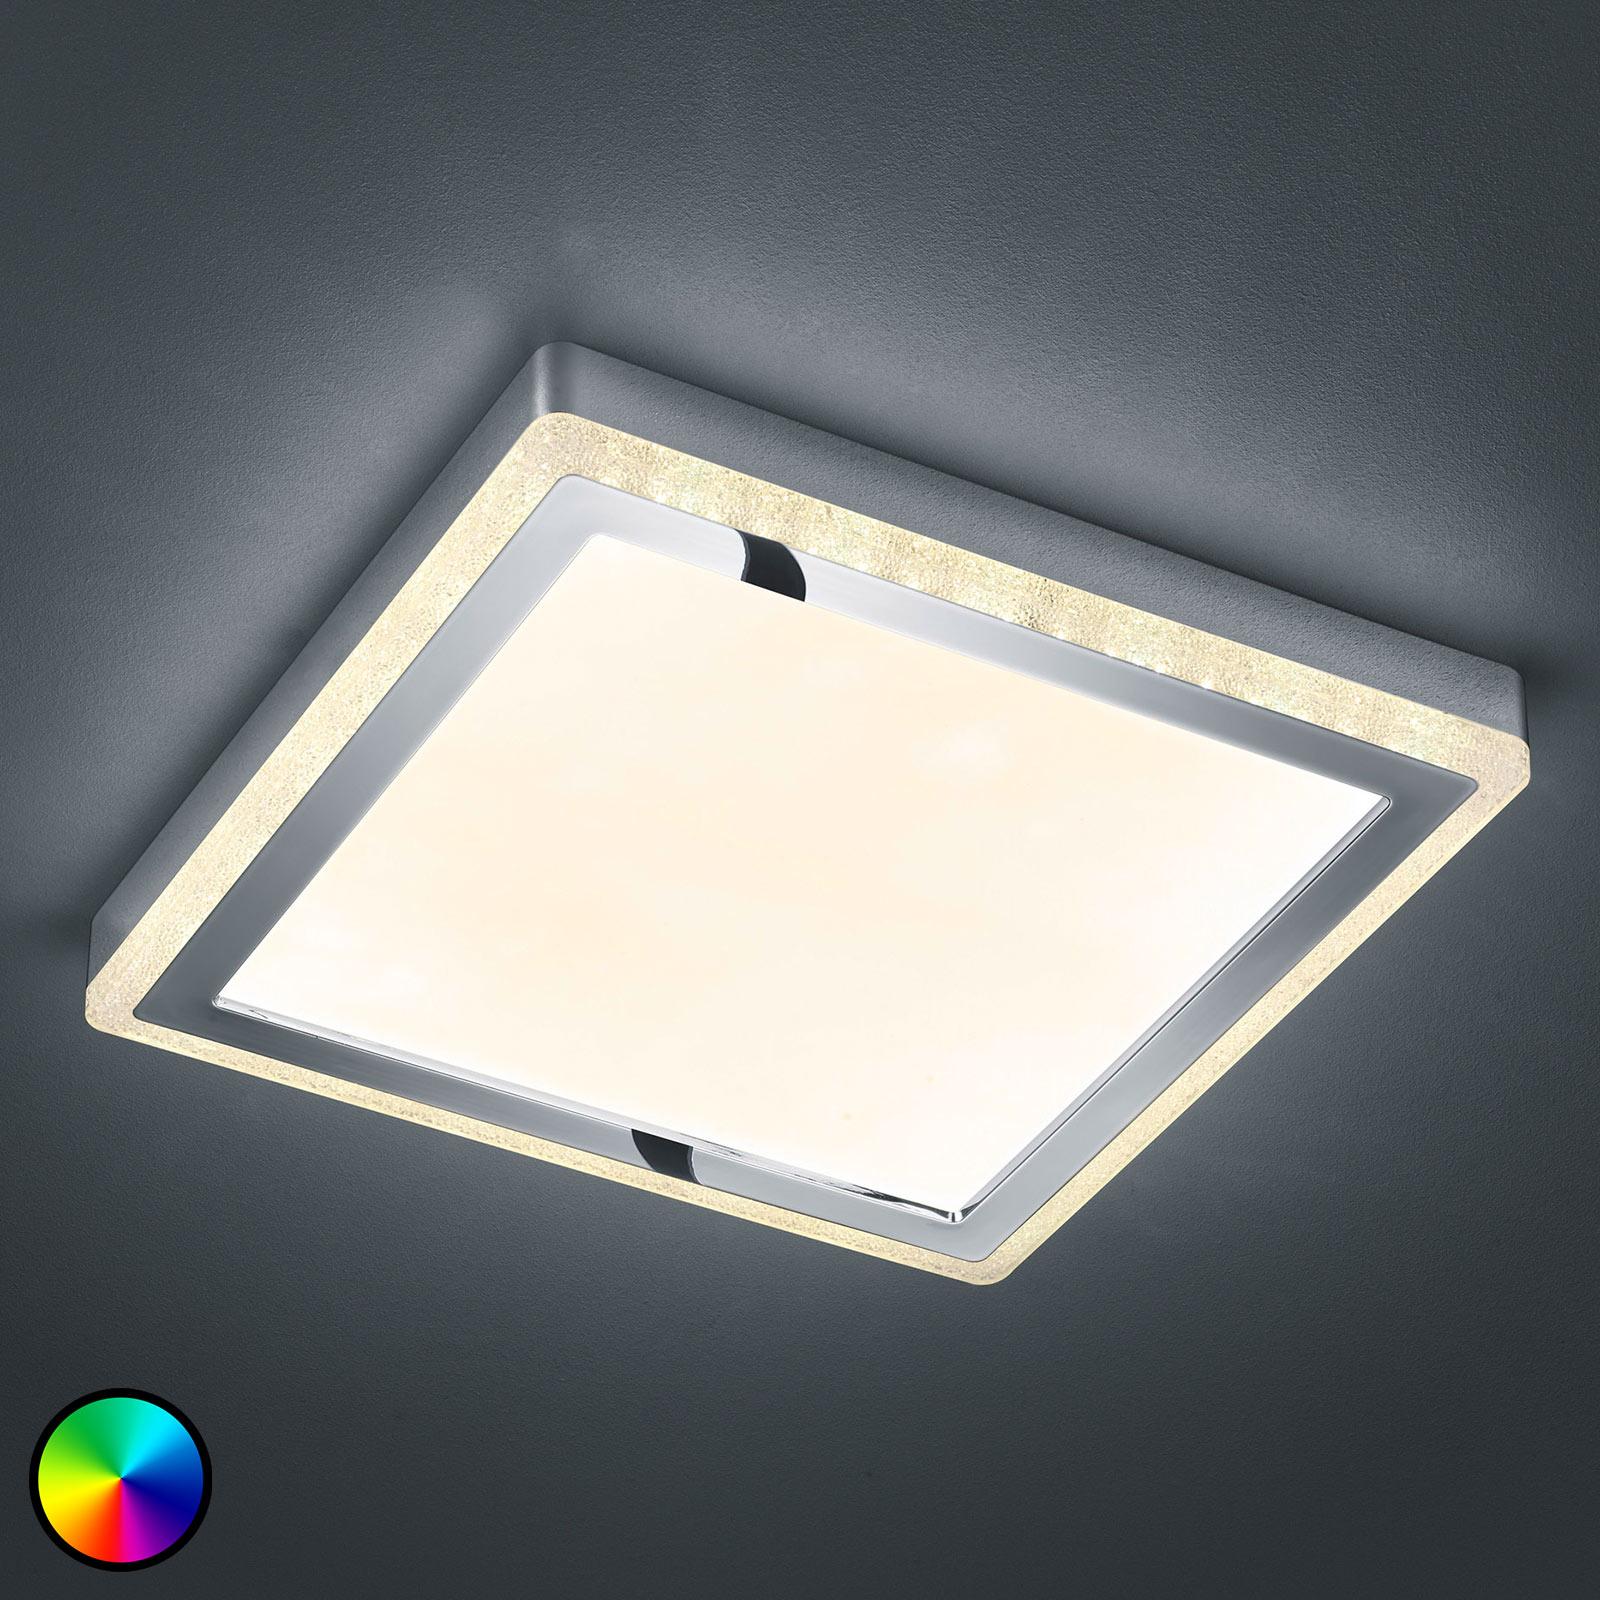 LED plafondlamp Slide, wit, hoekig, 40x40 cm